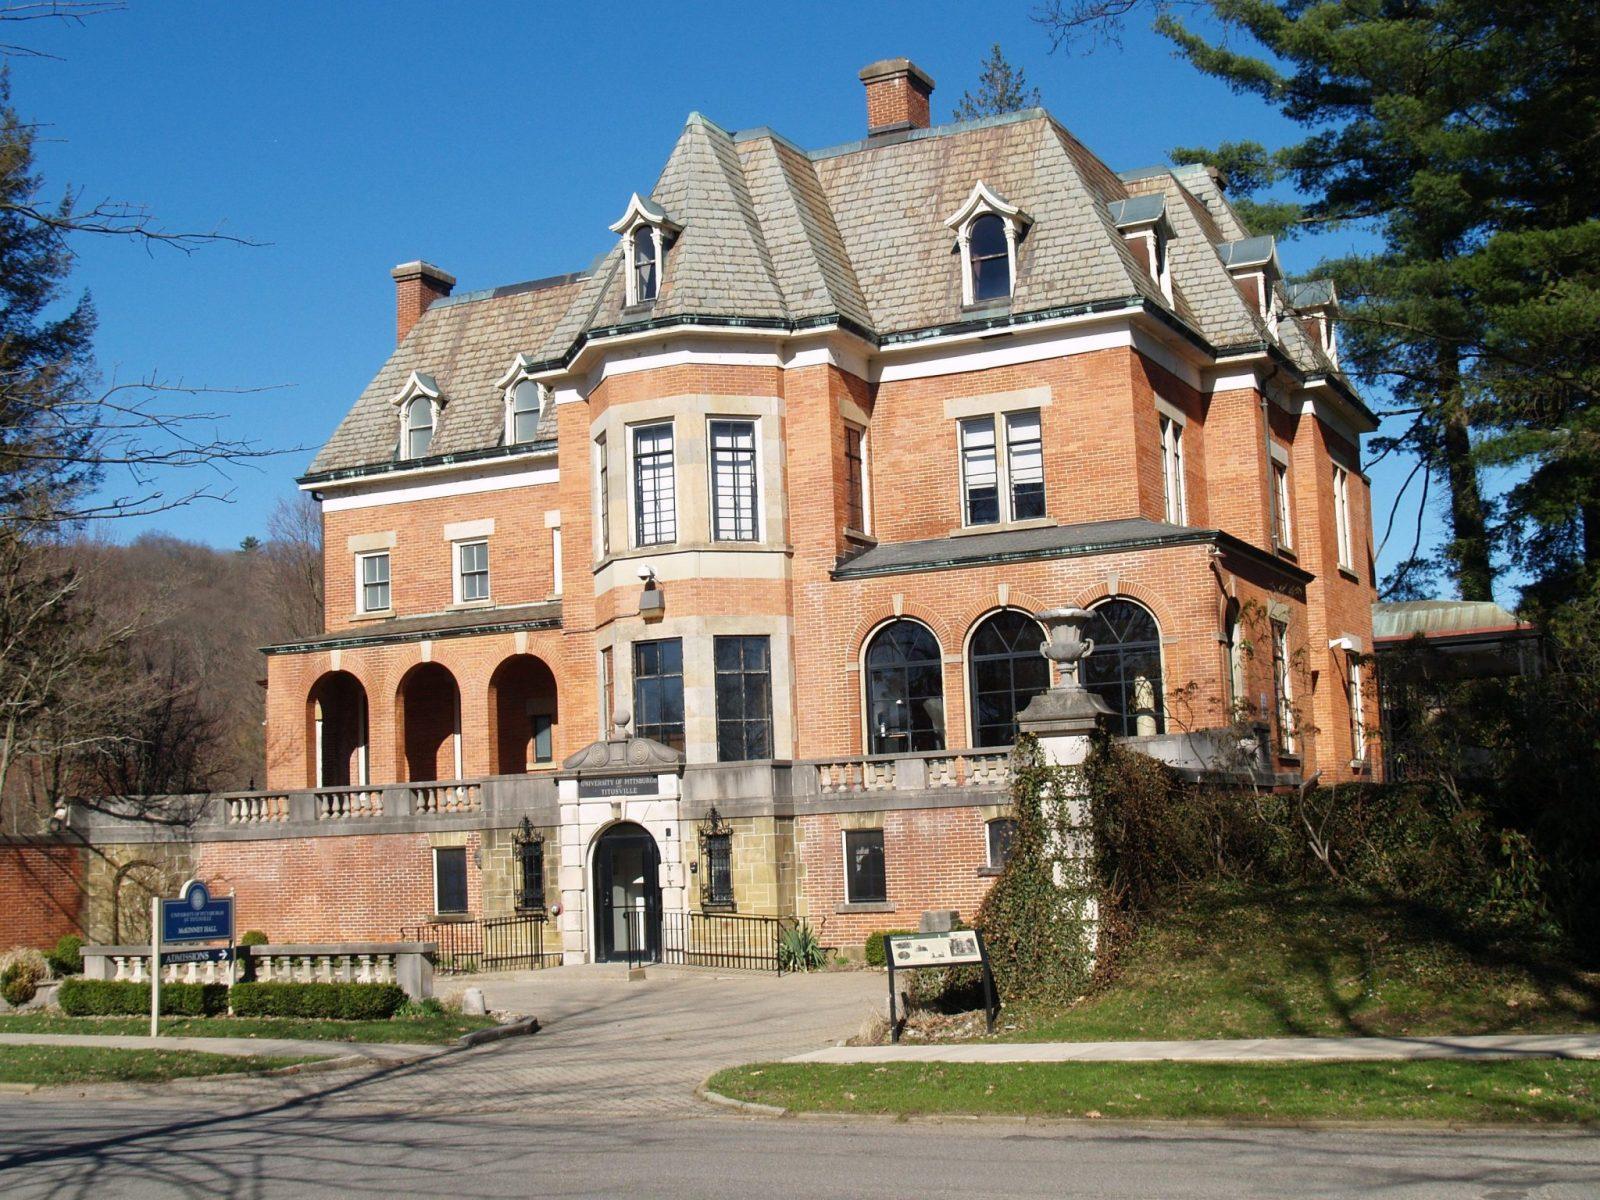 Picture of McKinney Hall in Titusville, Pennsylvania